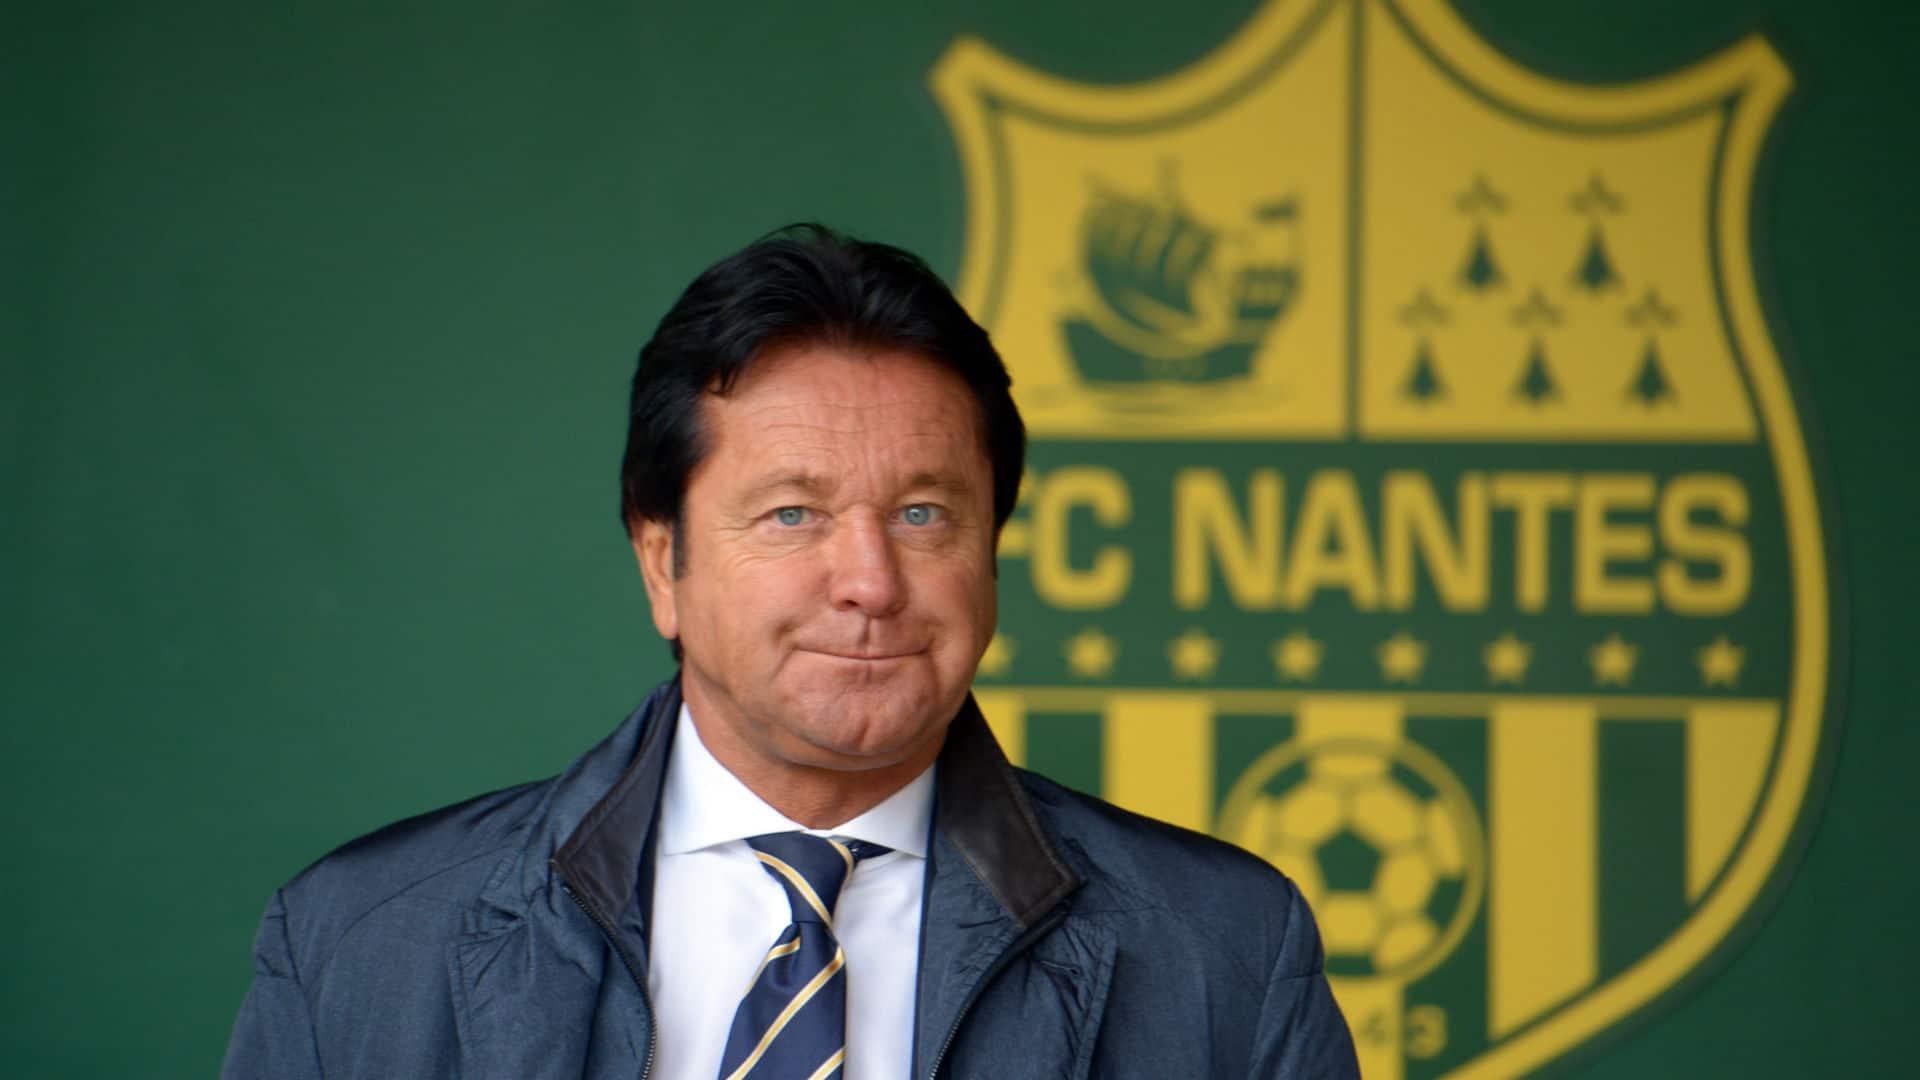 Waldemar Kita dirigeant du FC Nantes est-il un bon président ?